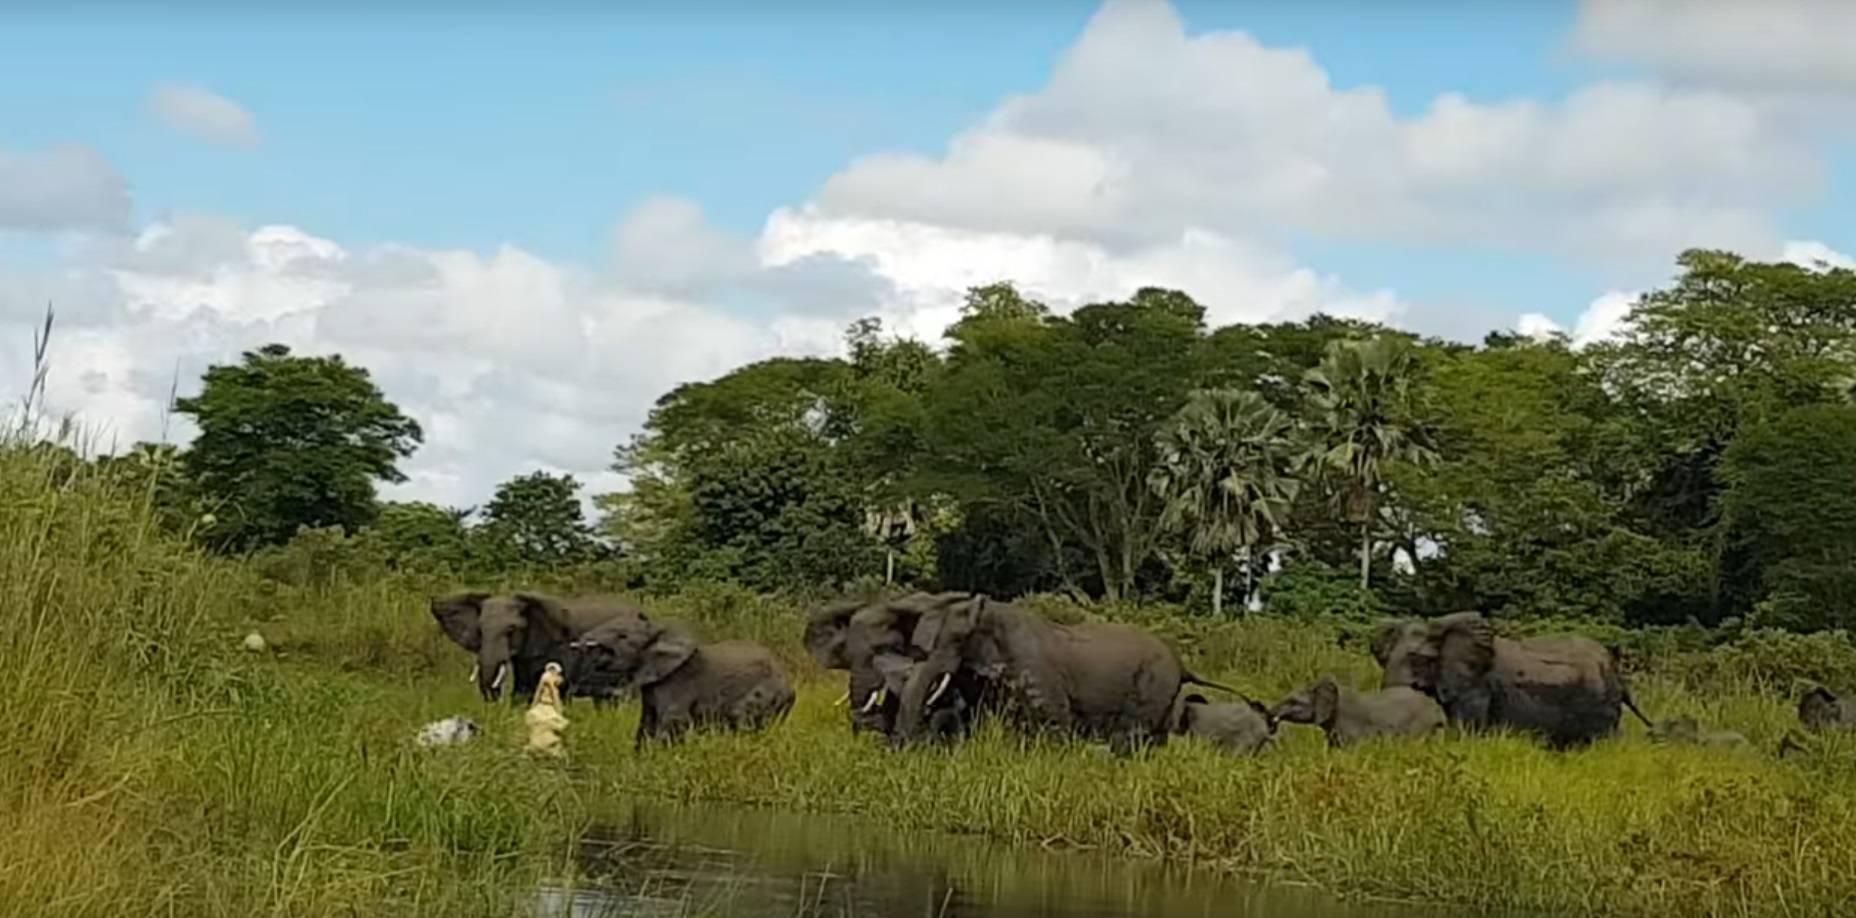 Kakva borba: Slonovi spasili surlu i obranili se od krokodila